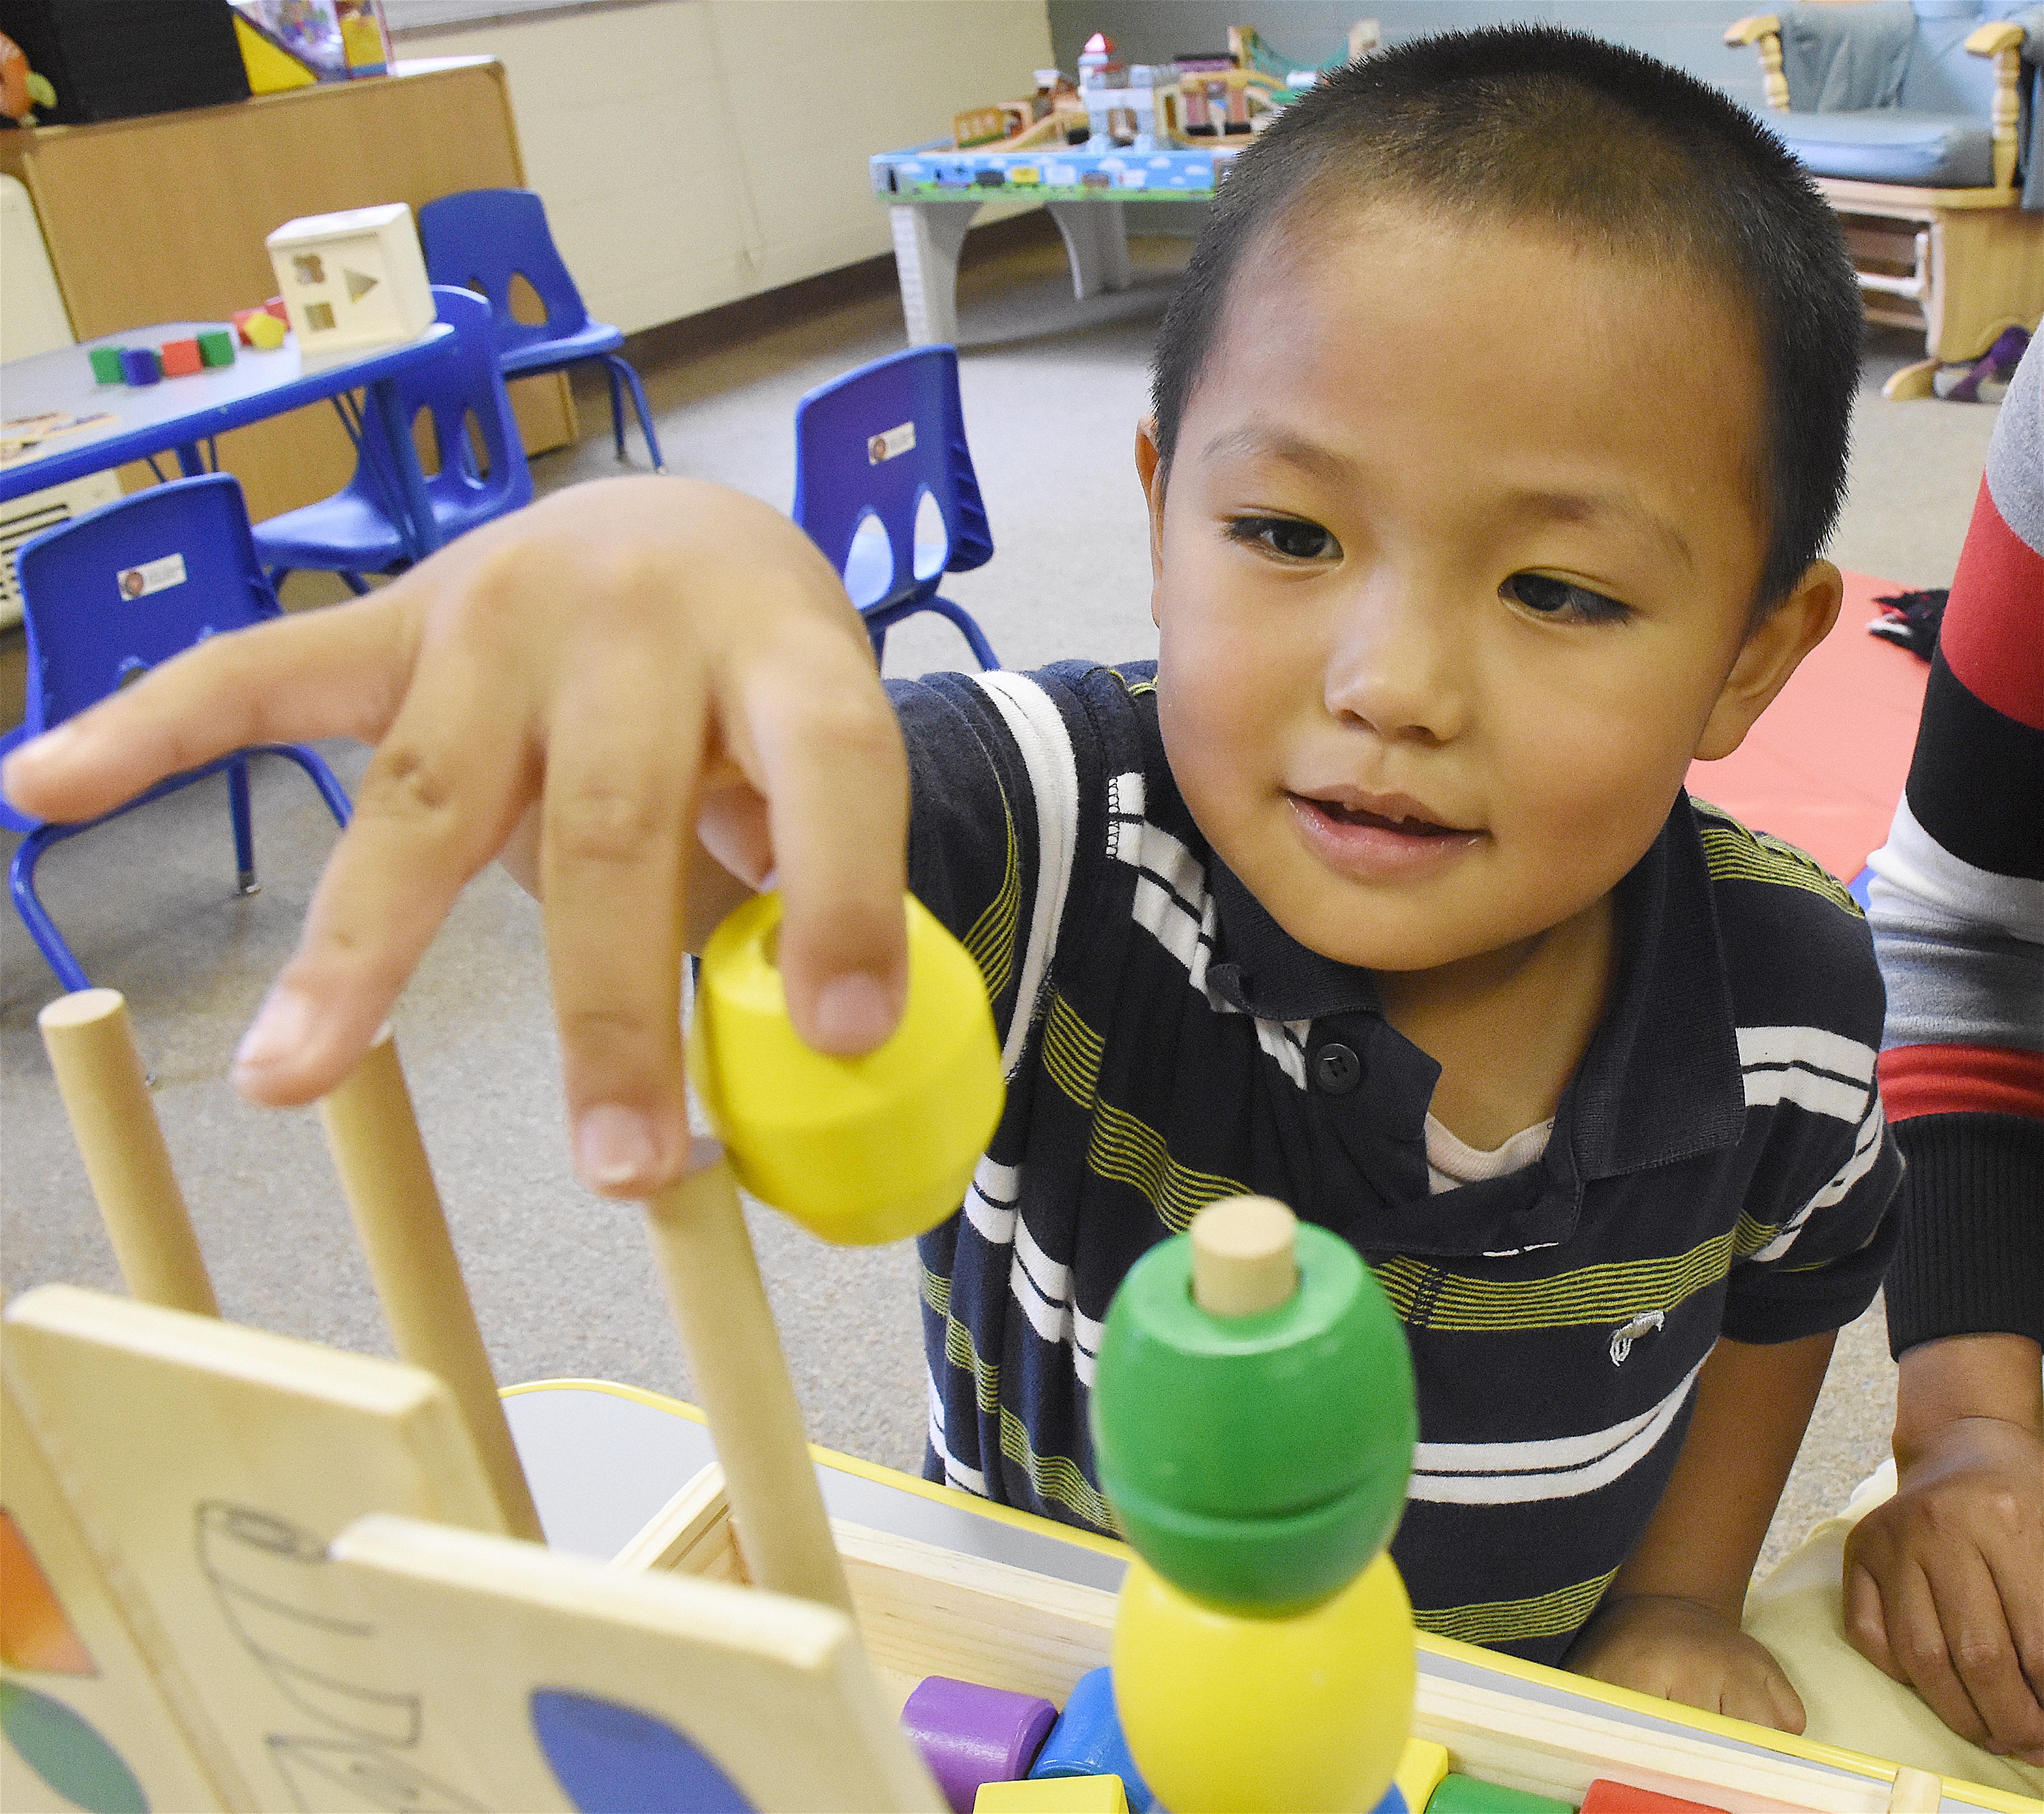 Johnny Grap Grap - Child Care DSC_5920 - 16HG-004 - Battle Creek Burma Center